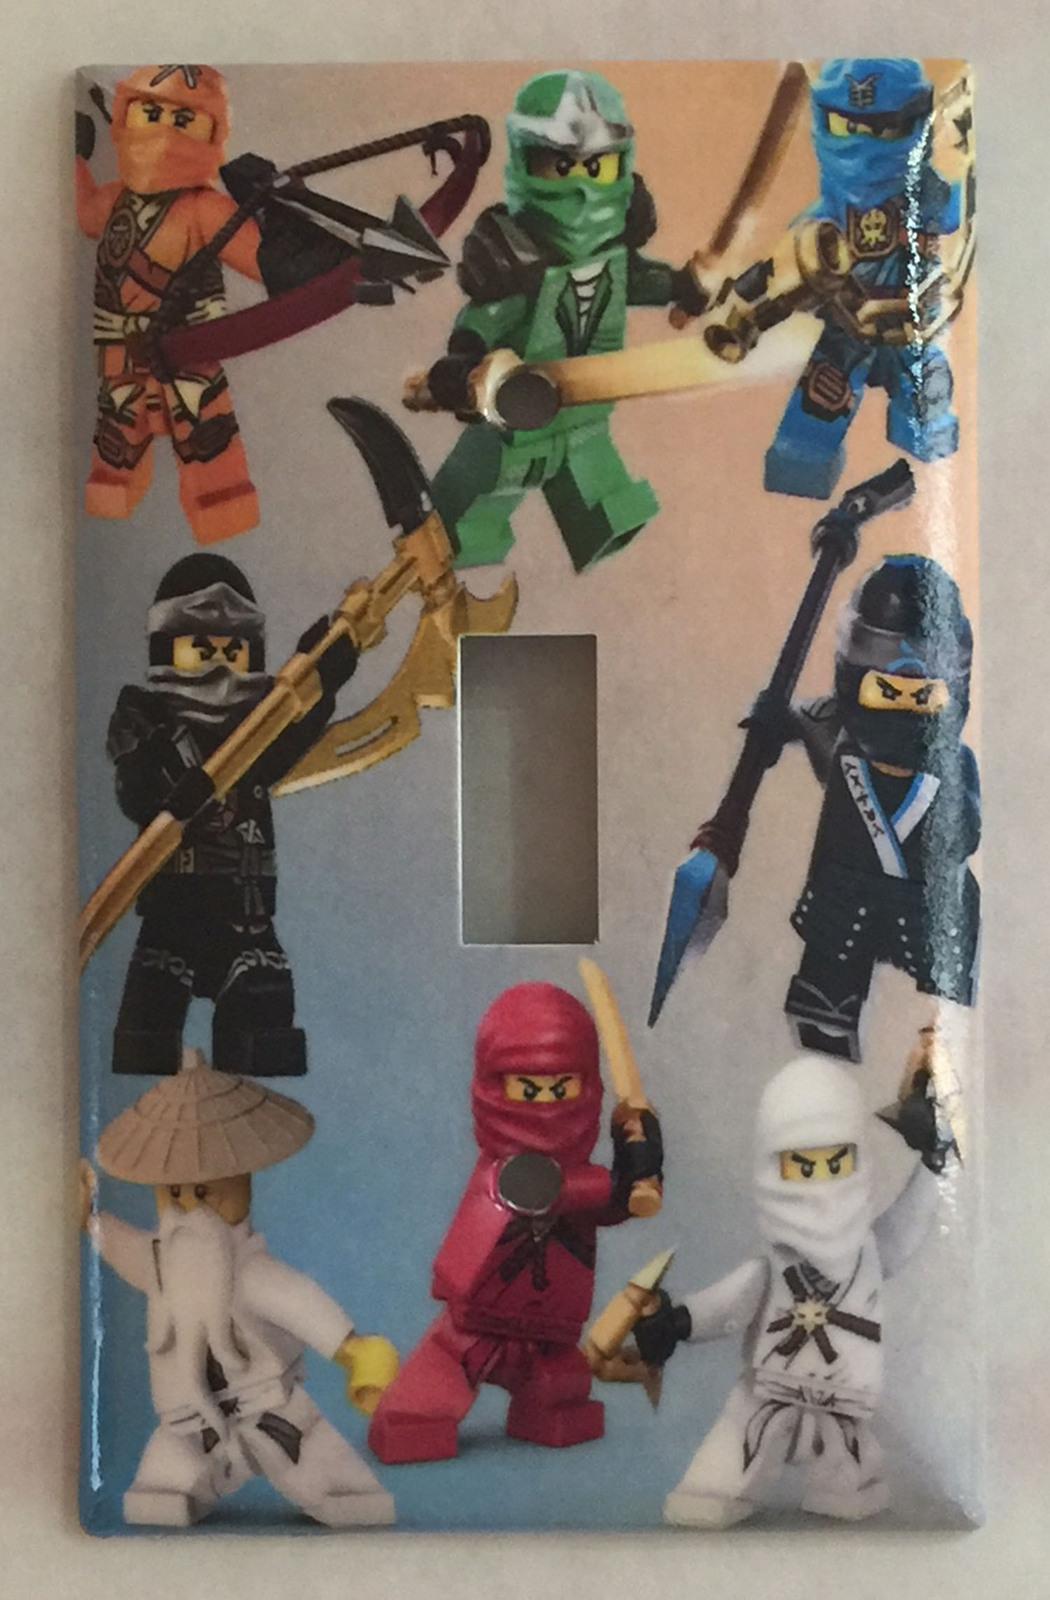 Lego ninji 8 toggle single